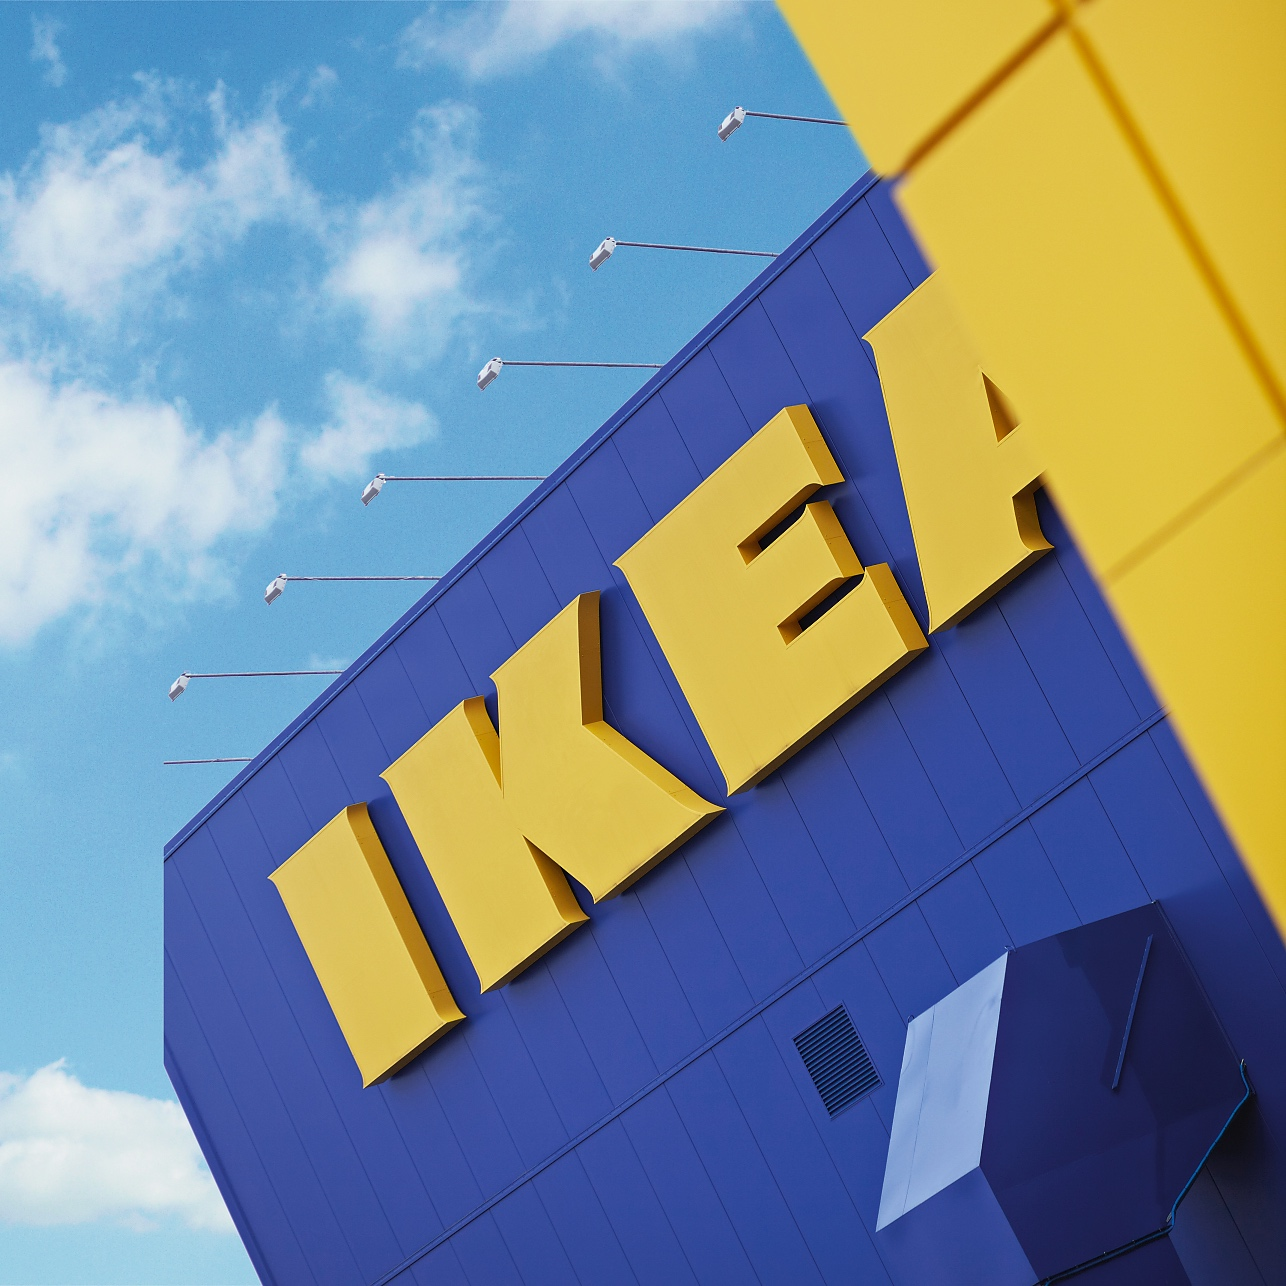 Photo by IKEA